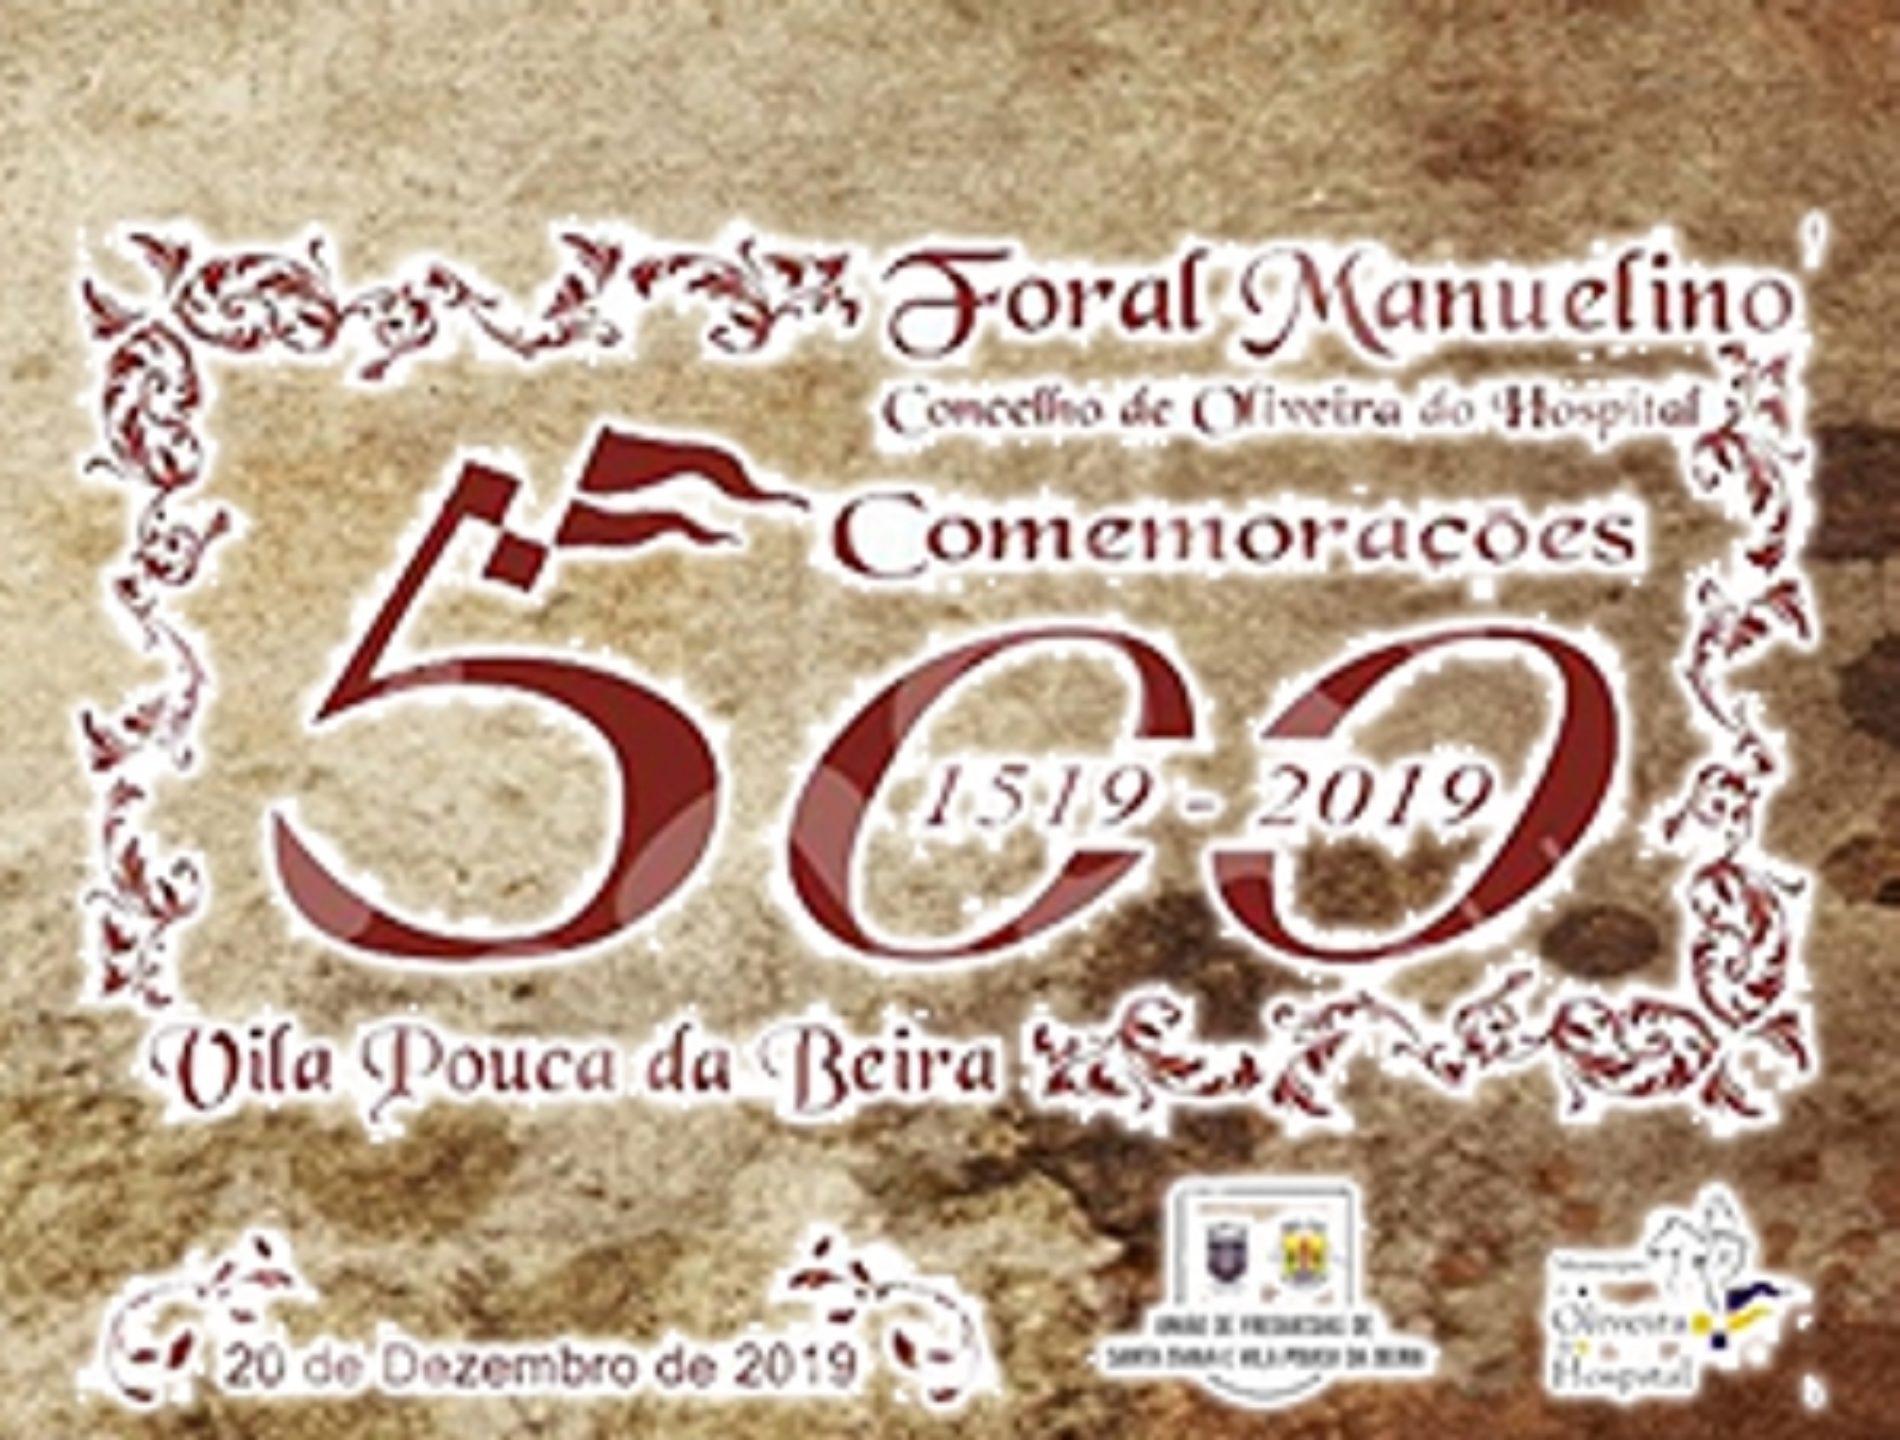 UF de Santa Ovaia e Vila Pouca da Beira comemora 500 anos de Foral Novo D. Manuel I